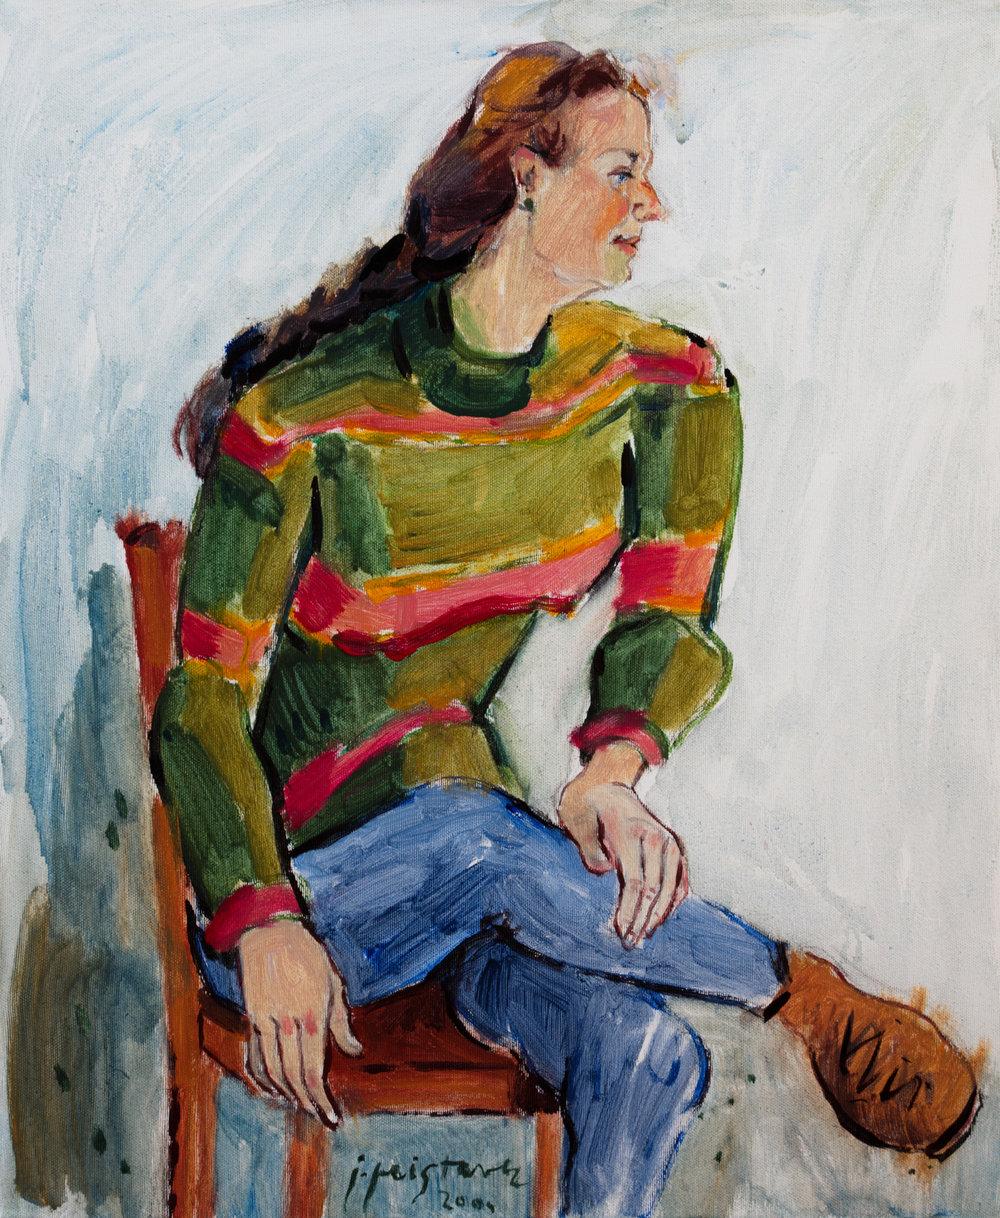 2000_portrait_50x60cm_Gaja_Janina.jpg